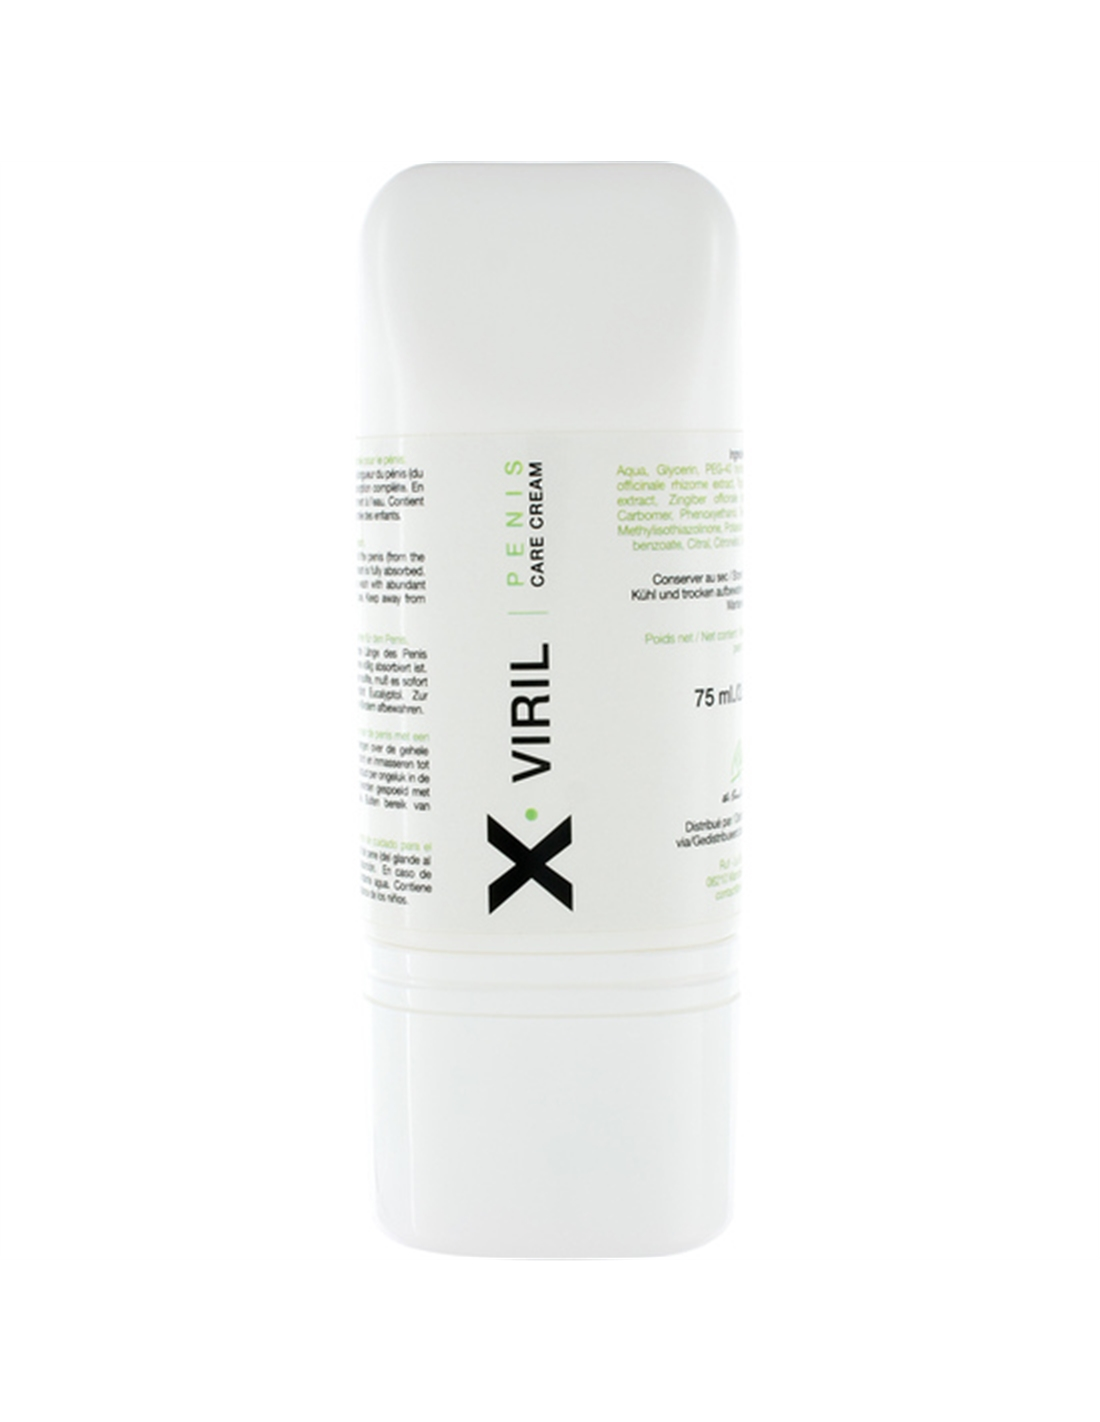 Creme X-Viril Para Homem - 75ml - PR2010323248